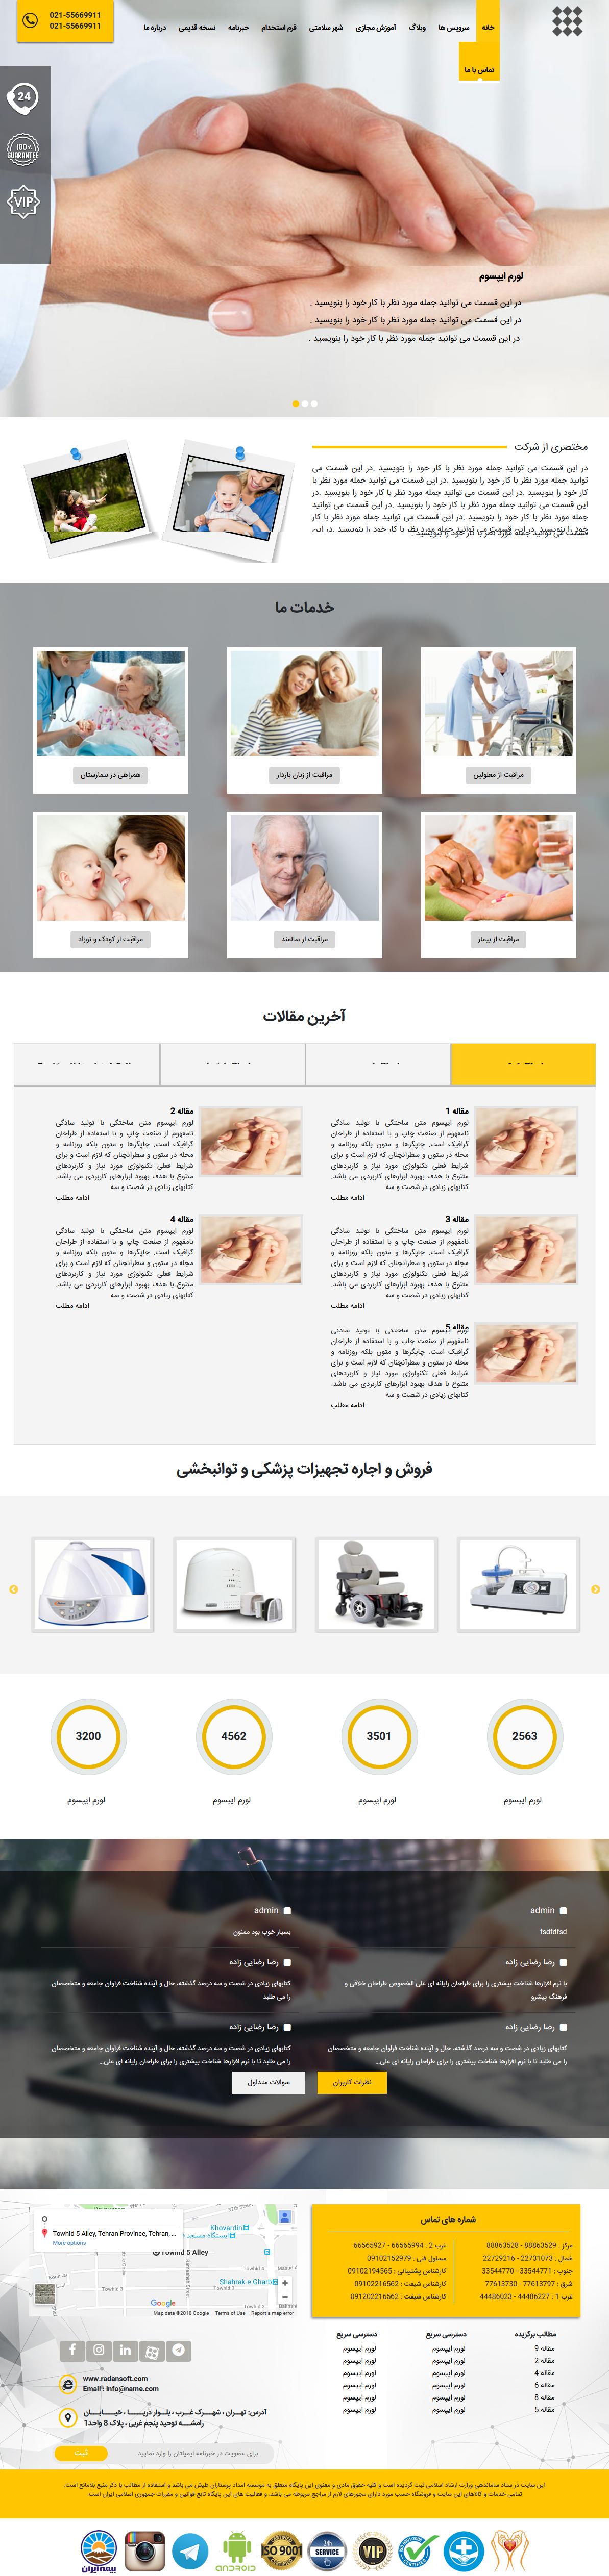 نمونه کار طراحی سایت ضربان